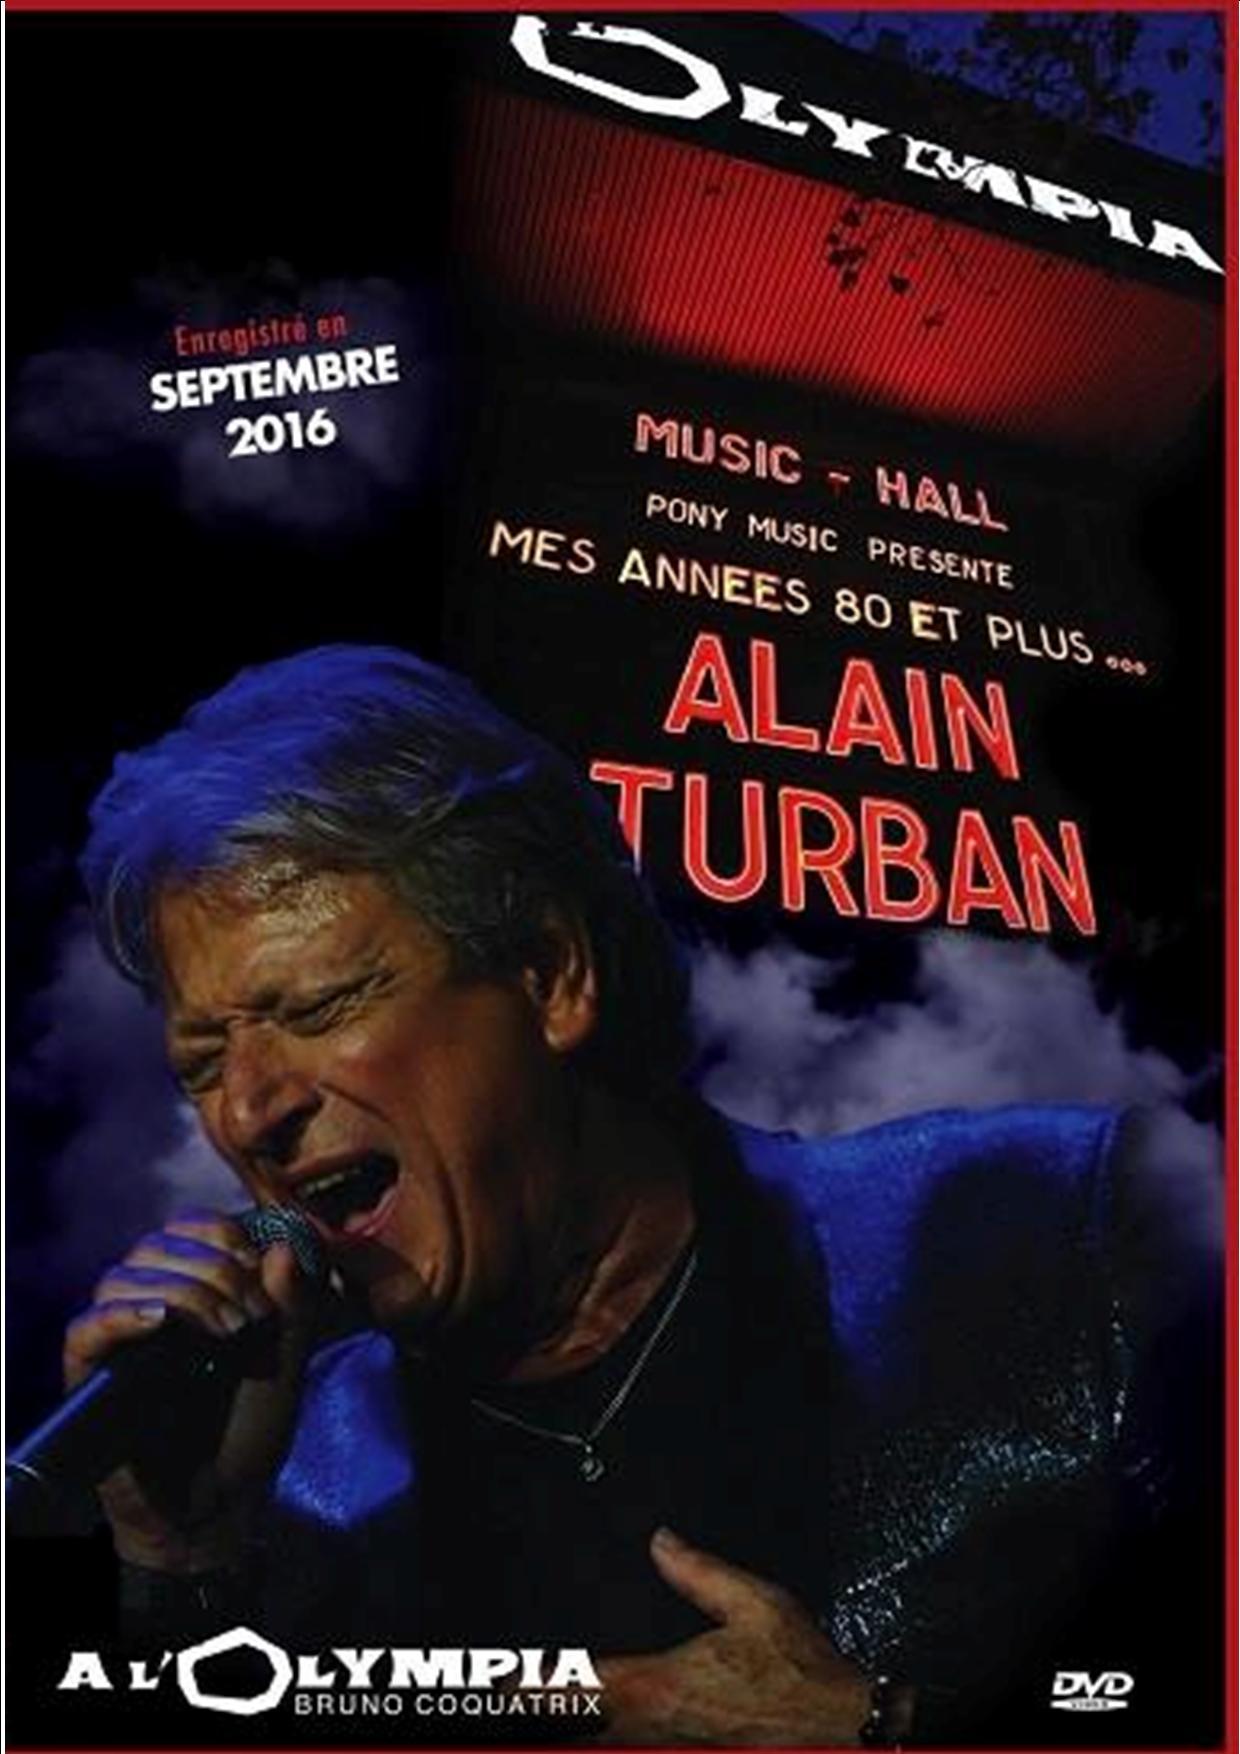 Turban dvd 2016